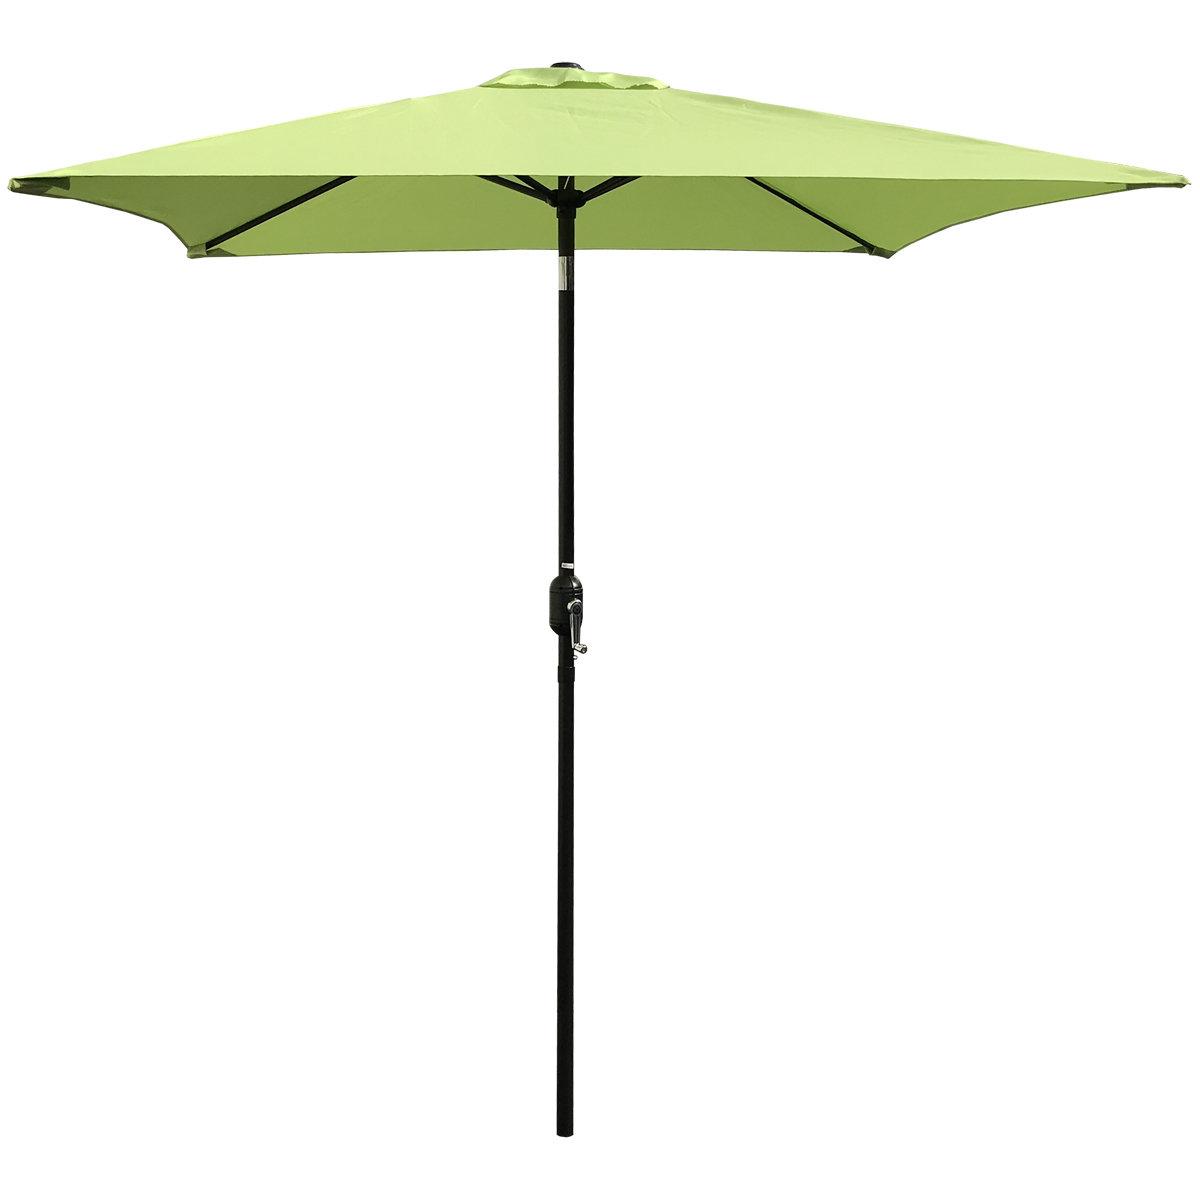 Latest Bradford Patiosquare Market Umbrellas With Regard To Bradford Patio 6.5' Square Market Umbrella (Gallery 1 of 20)